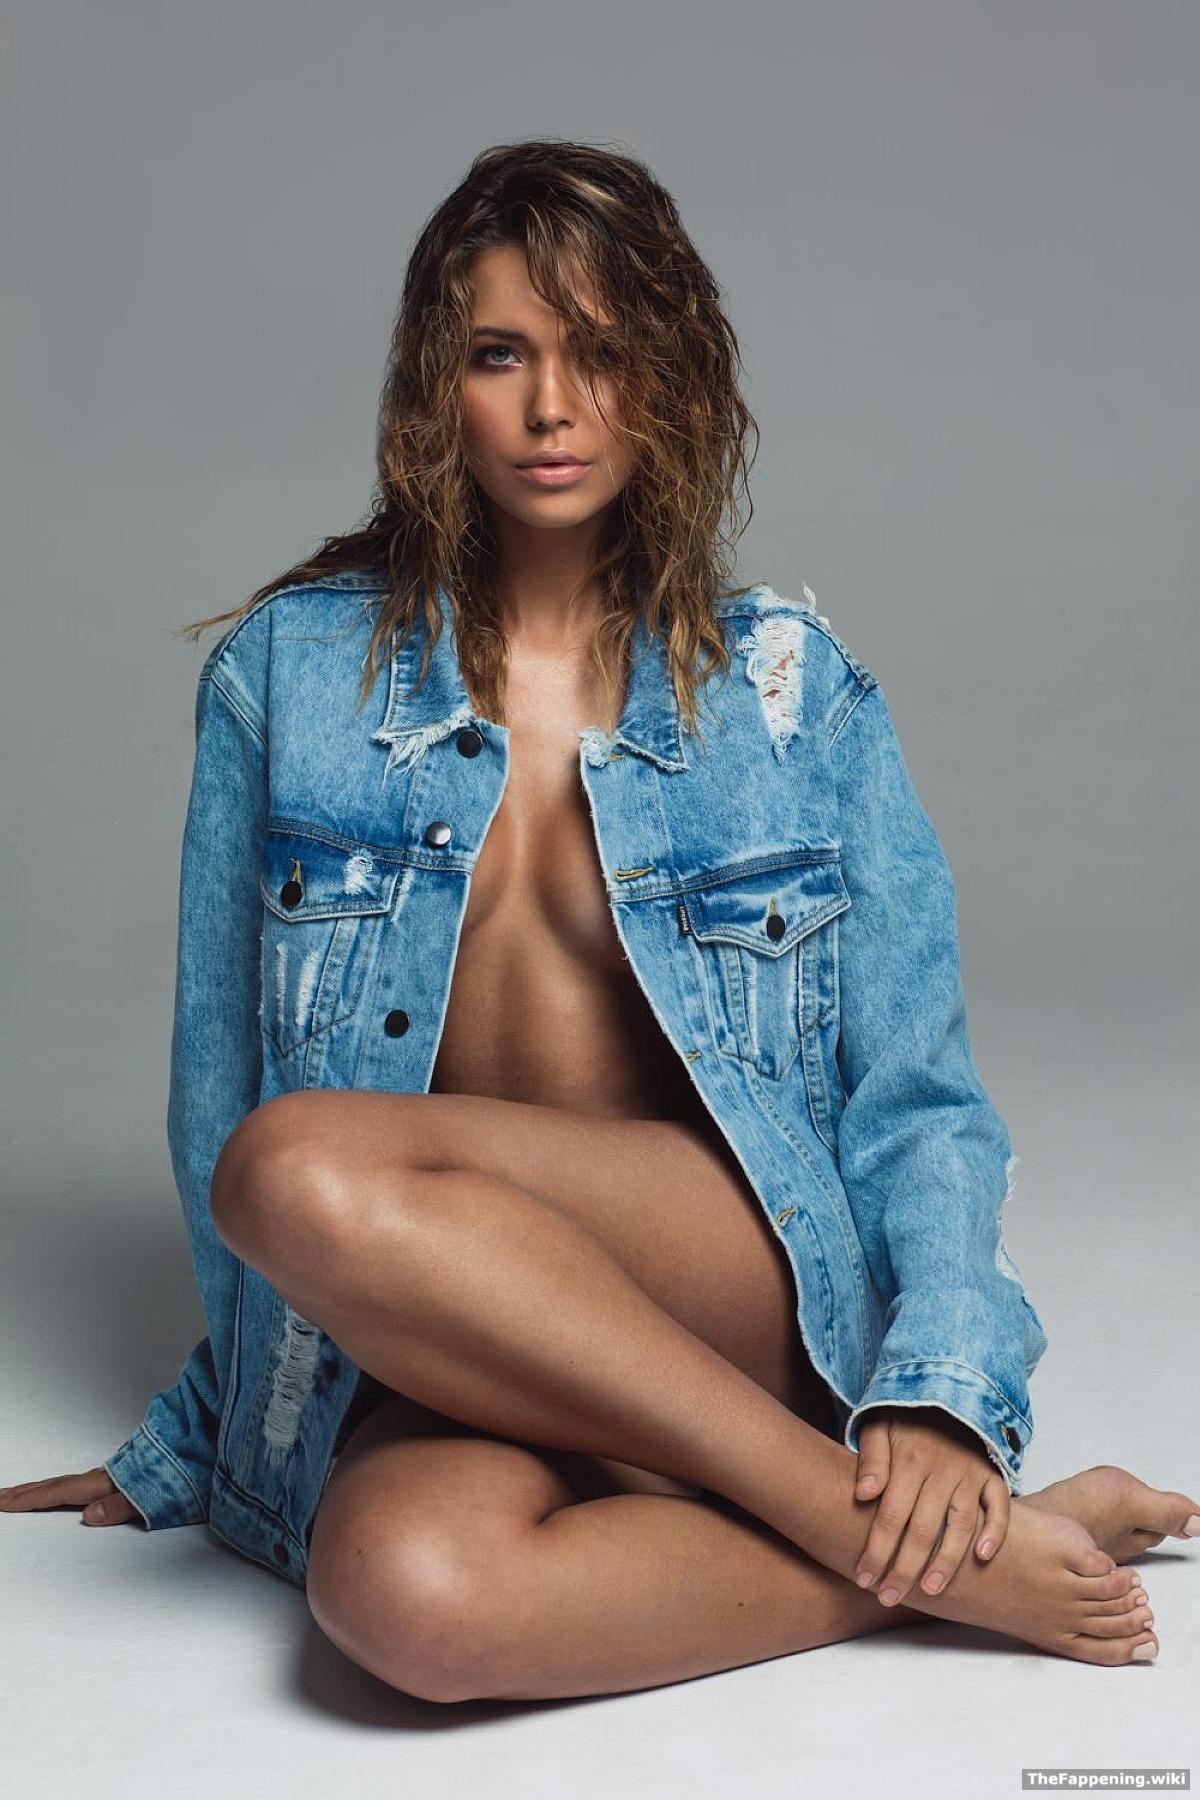 Sandra Kubicka Nude Pics Vids The Fappening